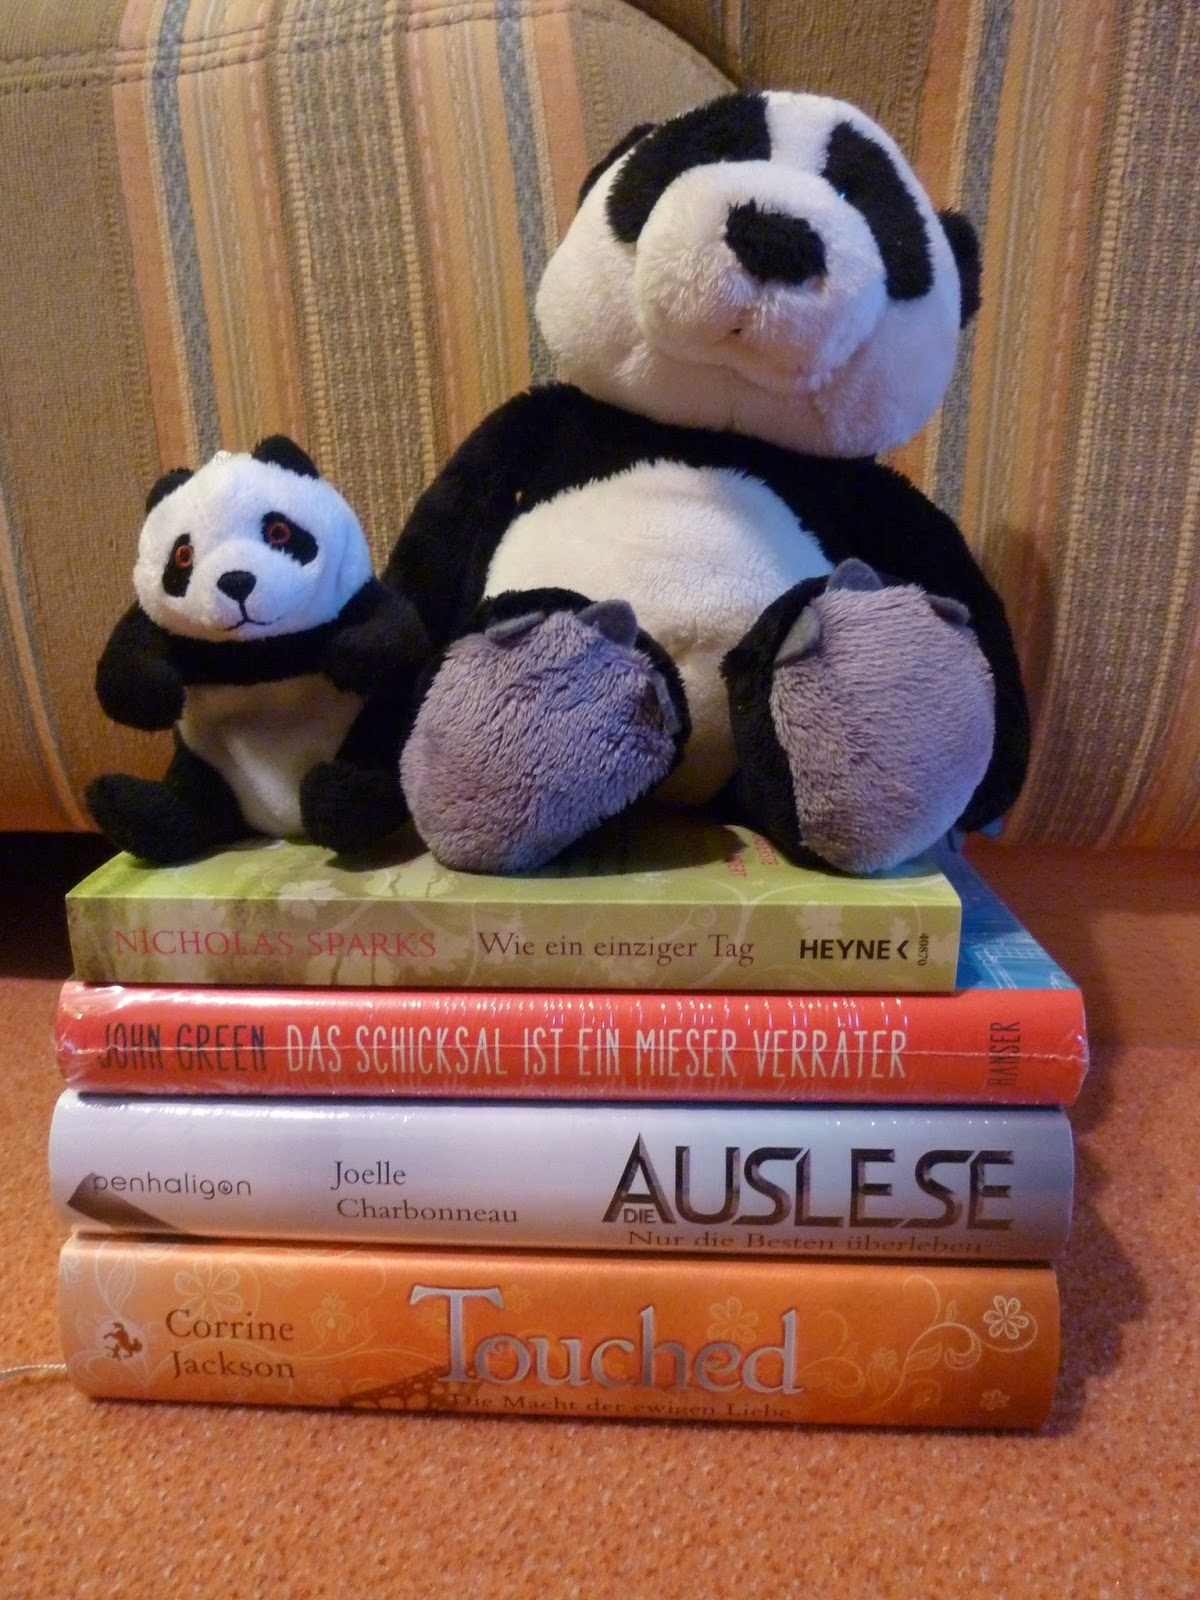 Neuzugänge - Buch Blog - Pandastic Books